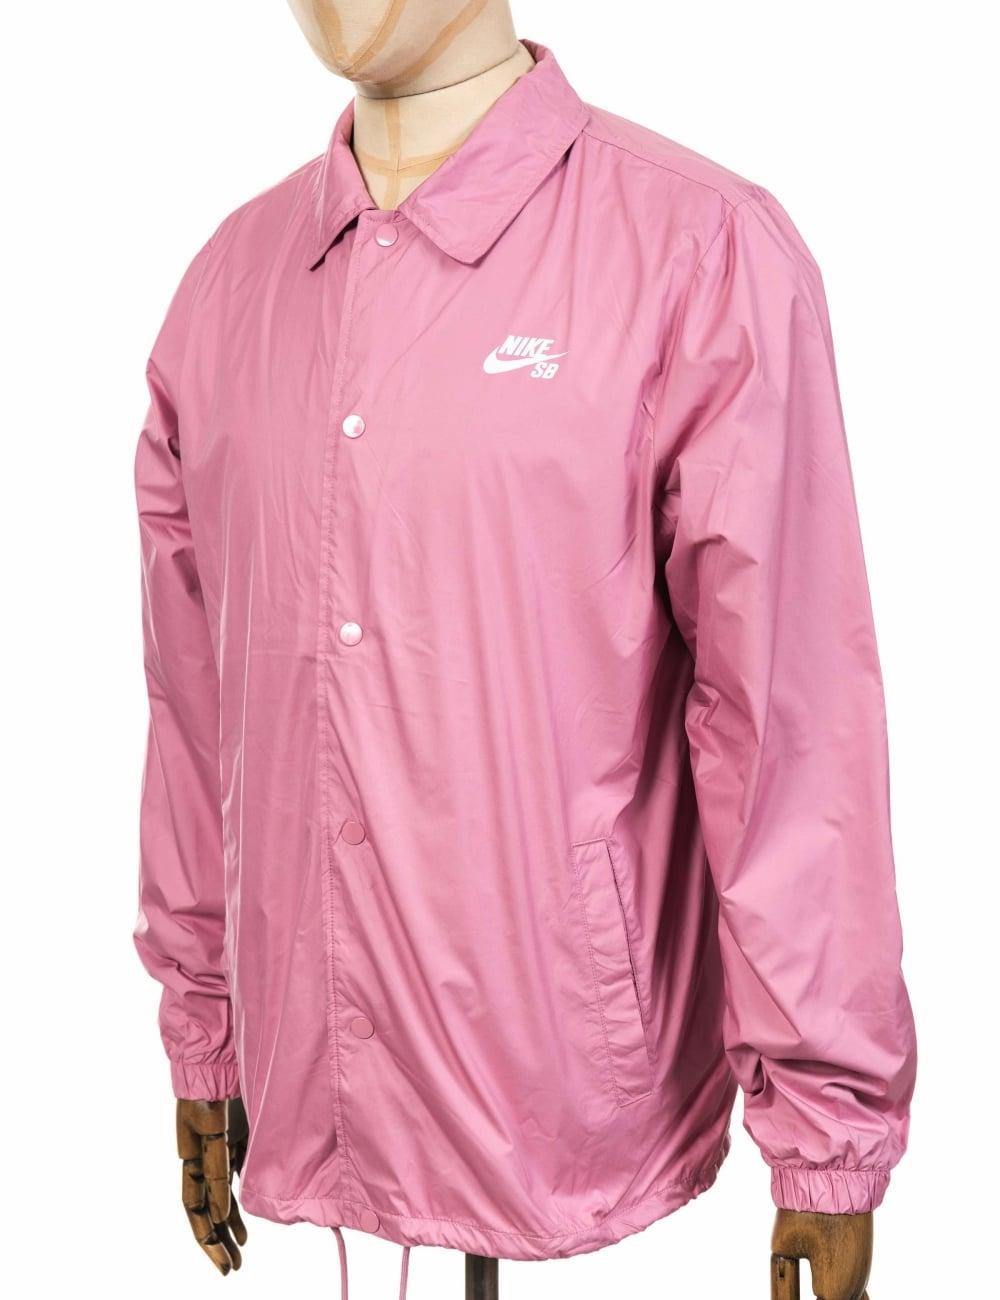 37a4357a7781dd Nike SB Shield Coach Jacket - Pink - Clothing from Fat Buddha Store UK